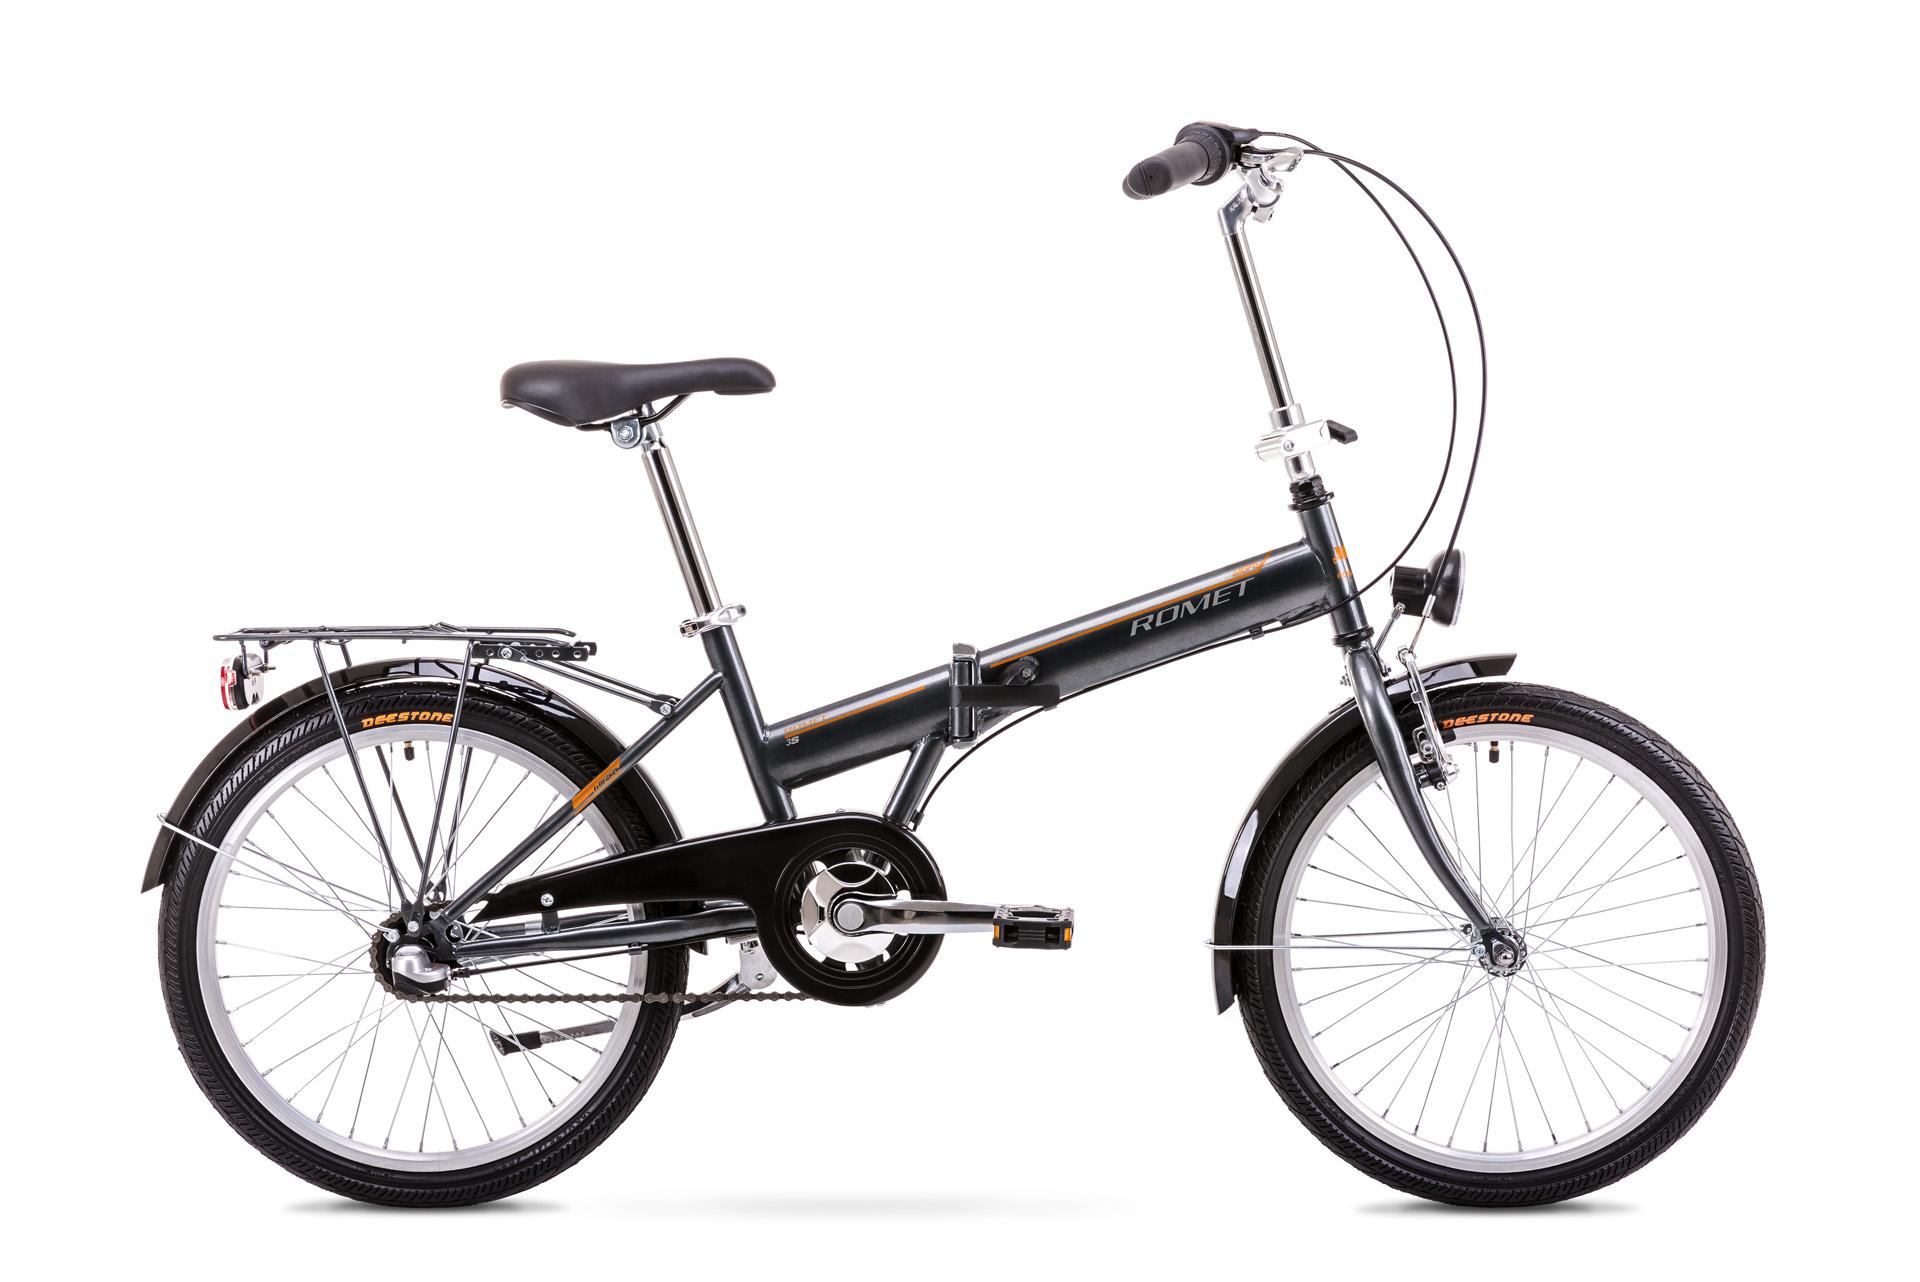 Bicicleta pliabila Unisex Romet Wigry 2 Grafit/Portocaliu 2019 imagine